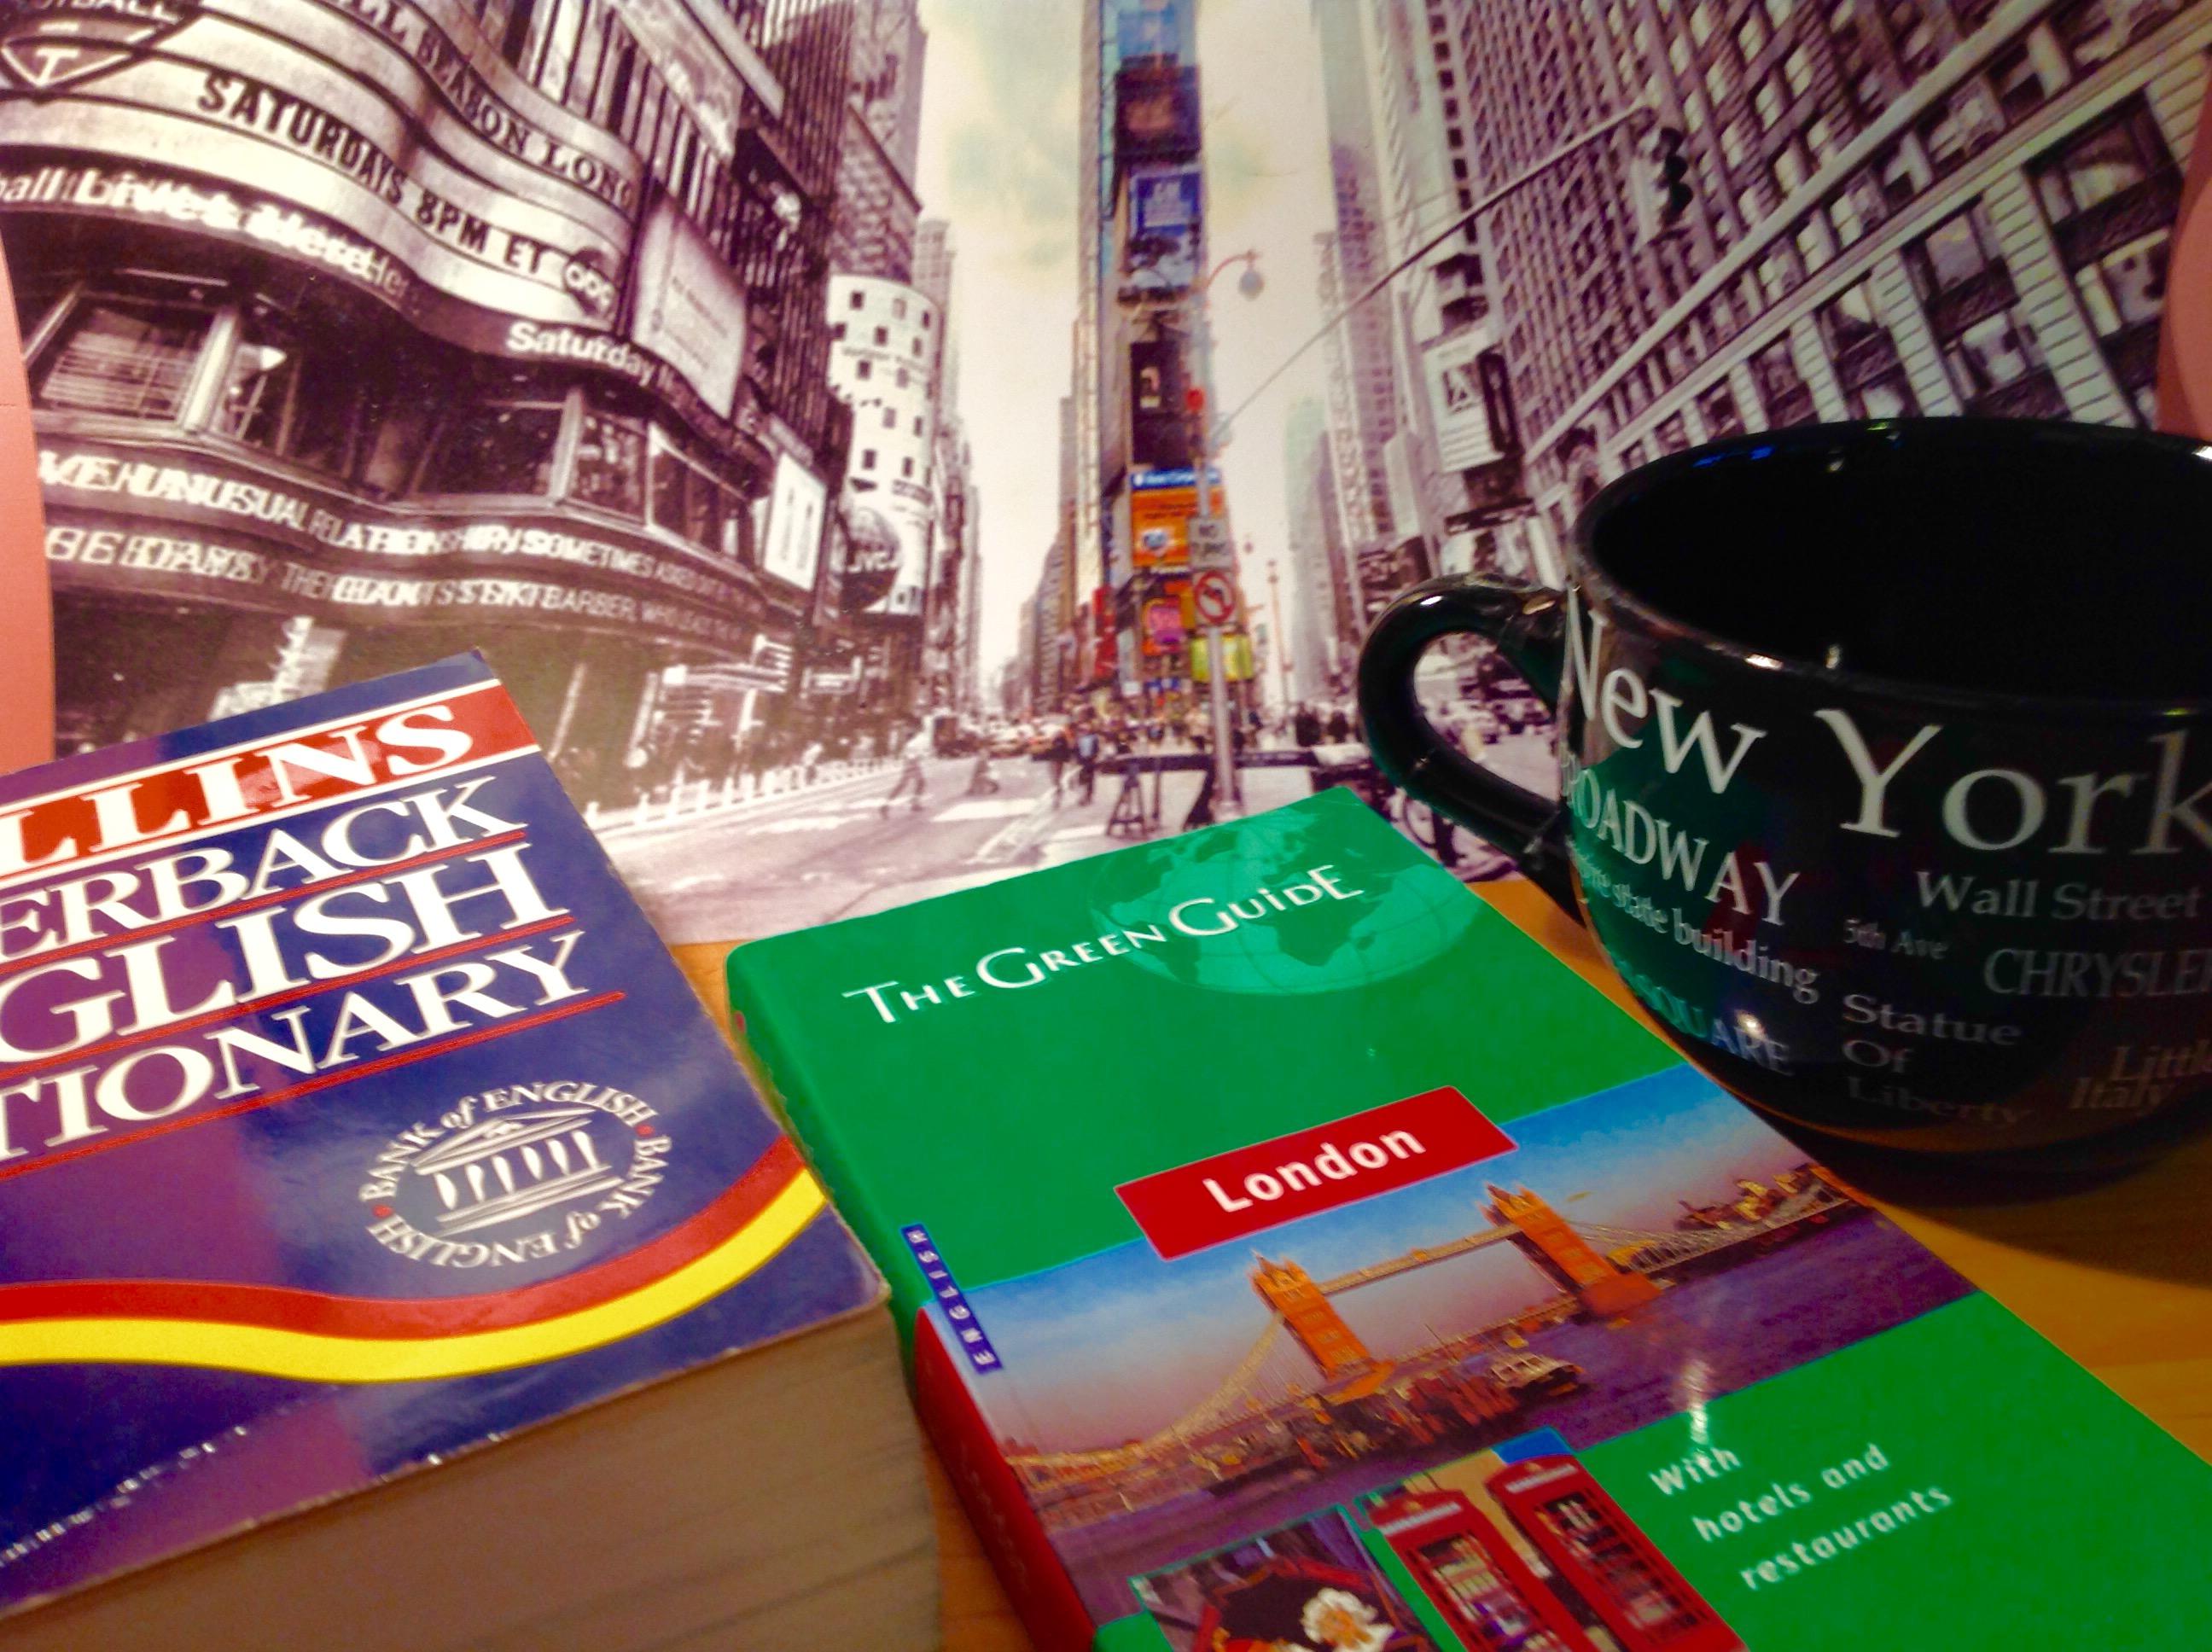 English & Italian articles